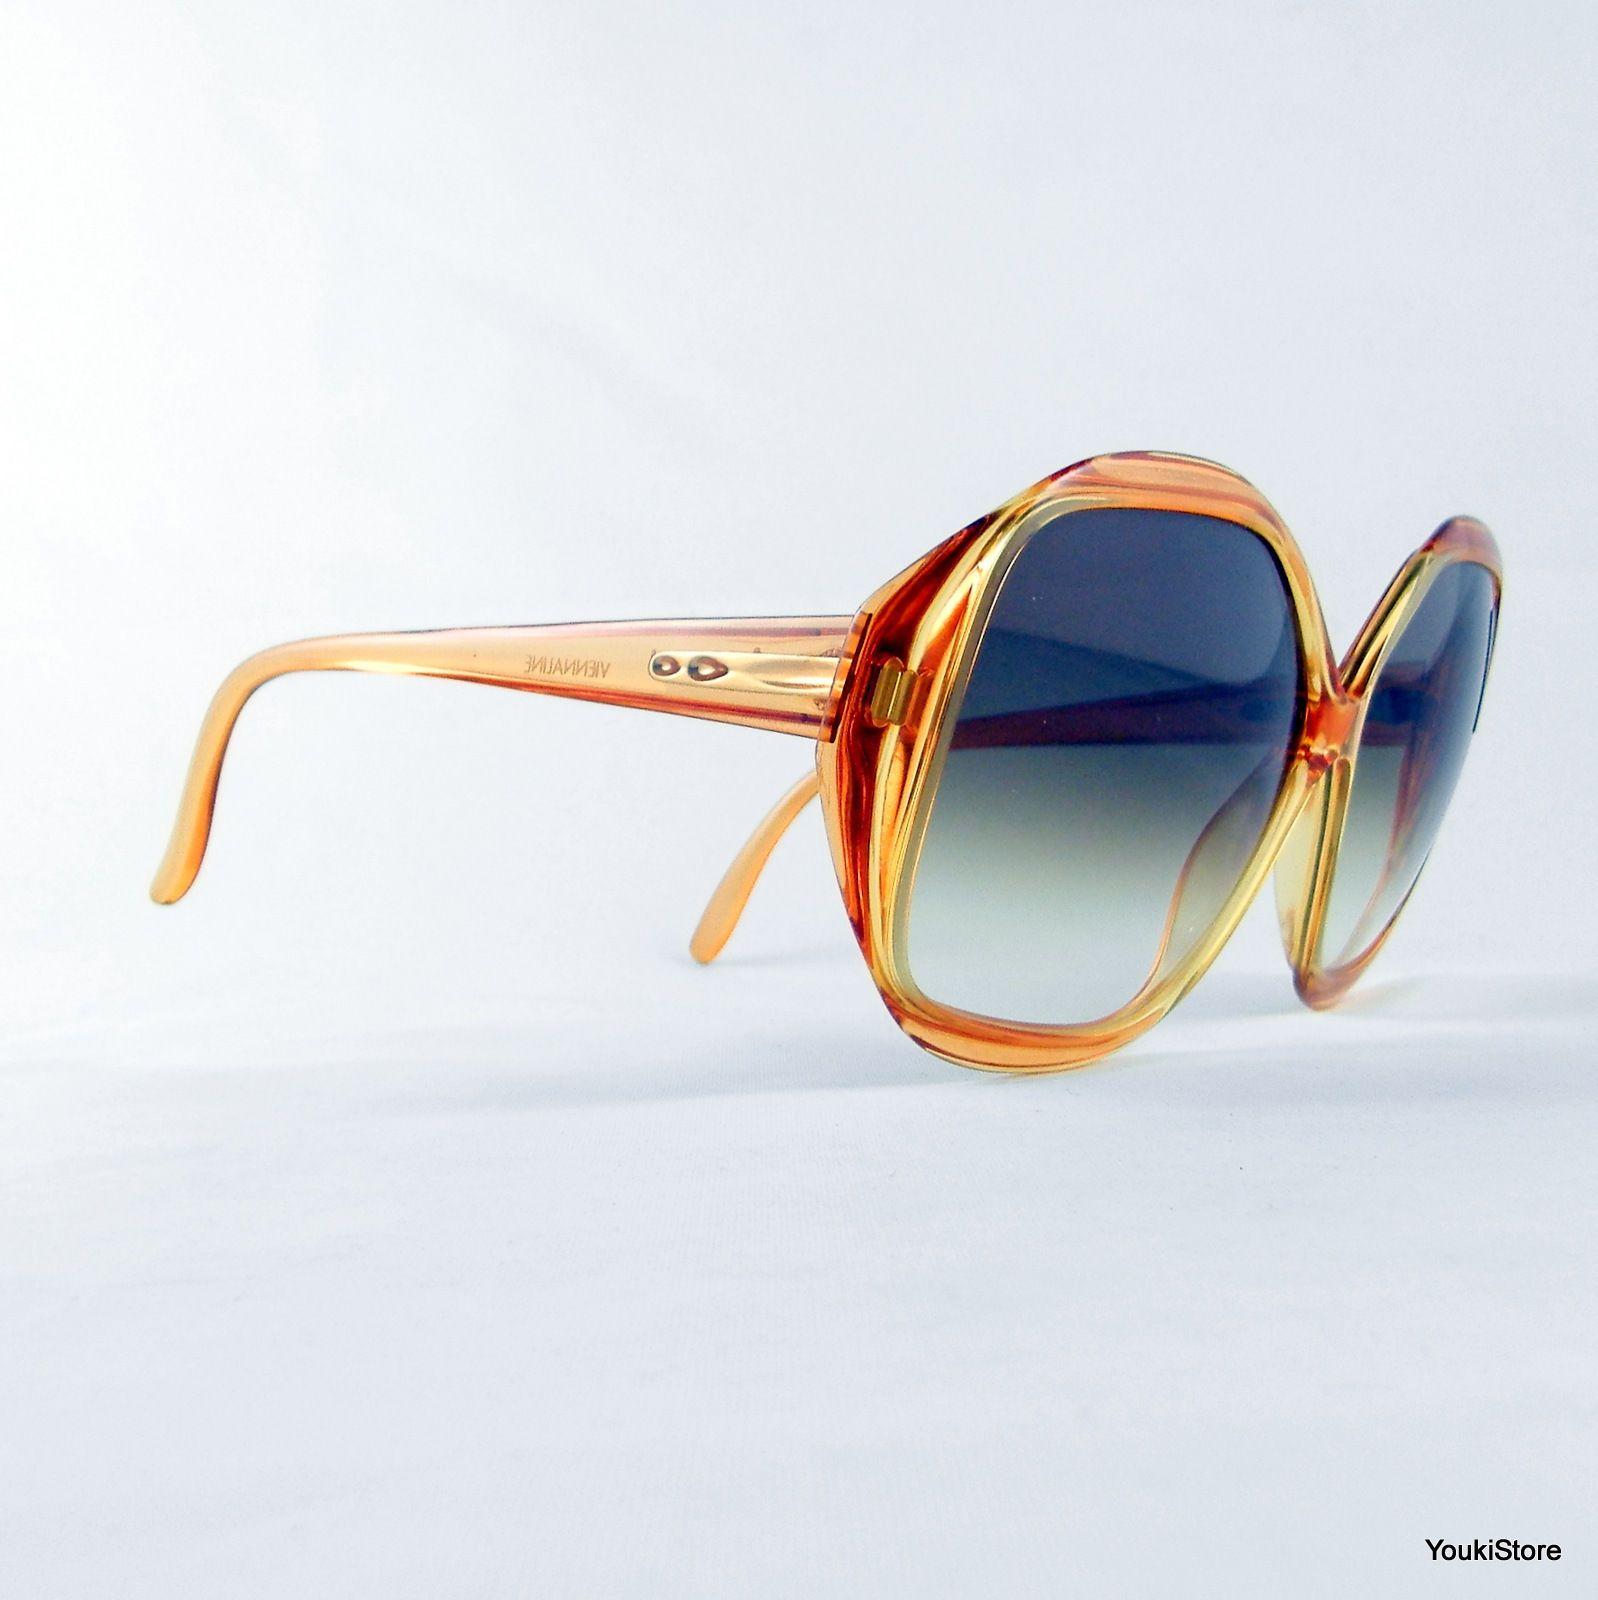 Viennaline Optyl Occhiali Da Sole 3524 40 60 20 135 Vintage Sunglasses New